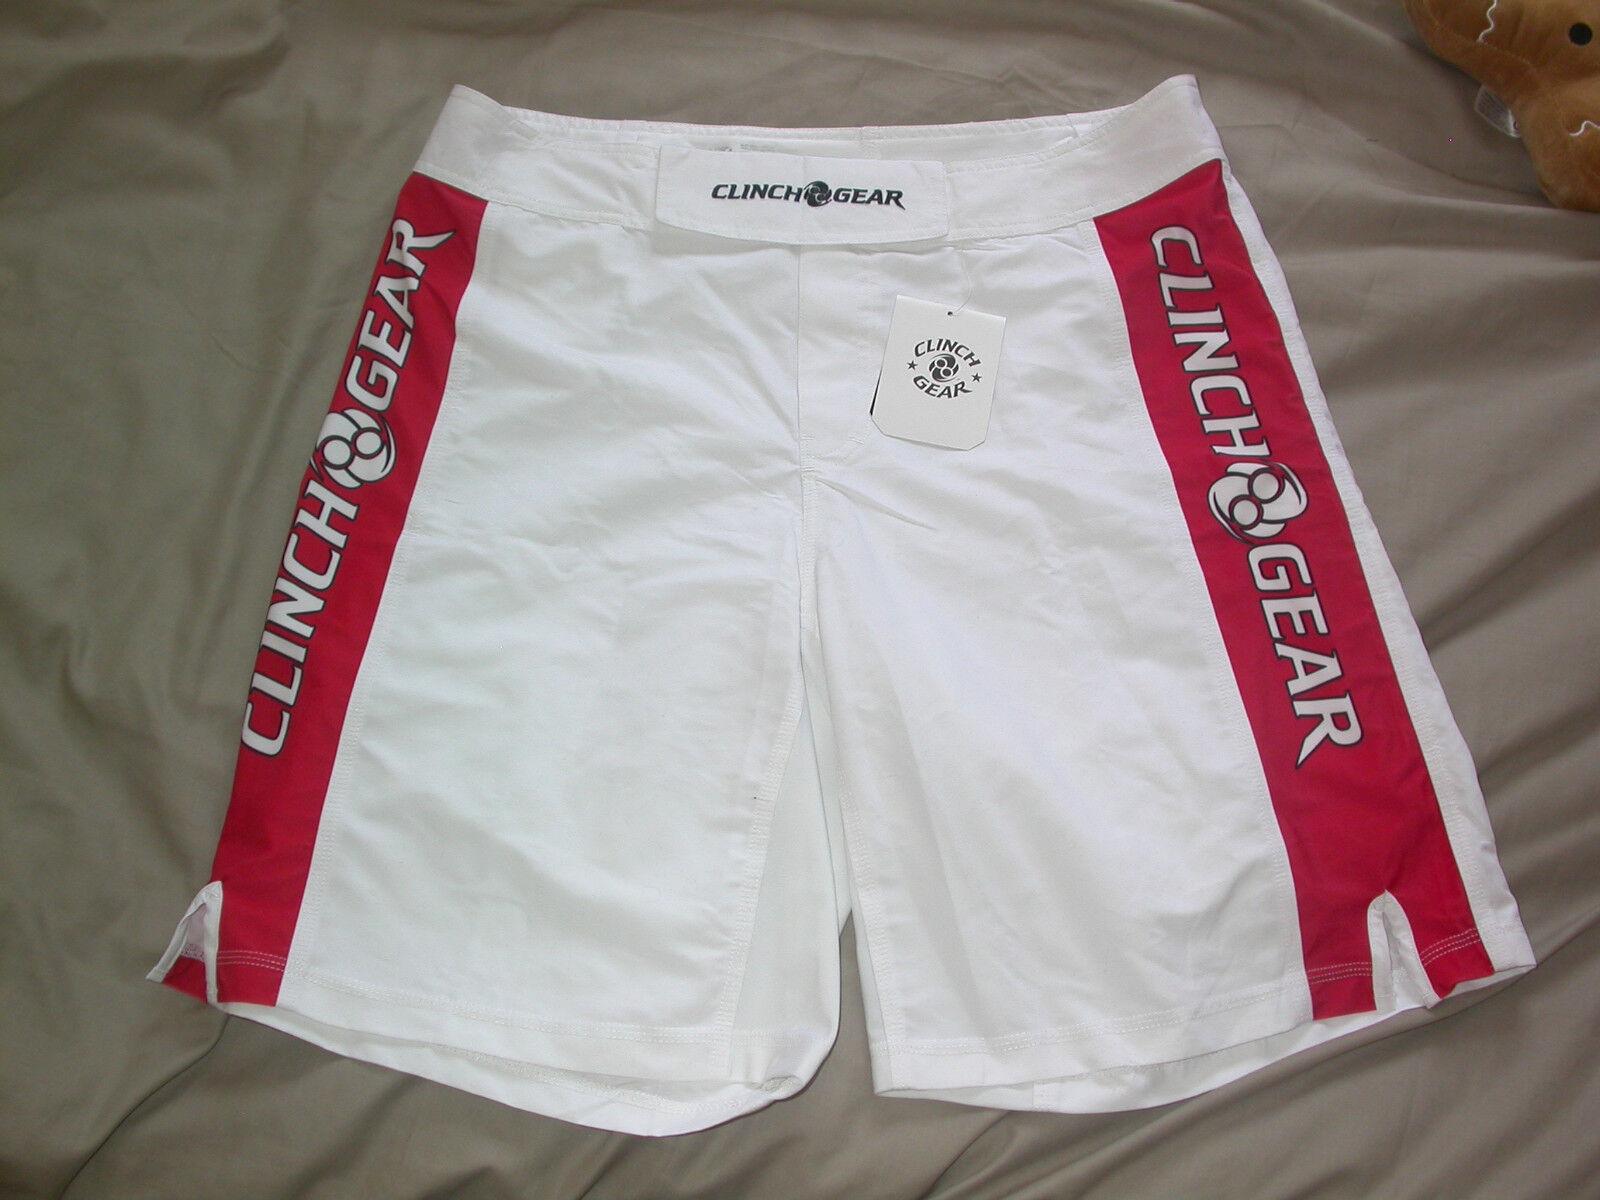 CLINCH GEAR SHORTS 36W XL EXTRA LARGE . UFC MMA BJJ JIU JITSU NOGI KSW GYM NEW